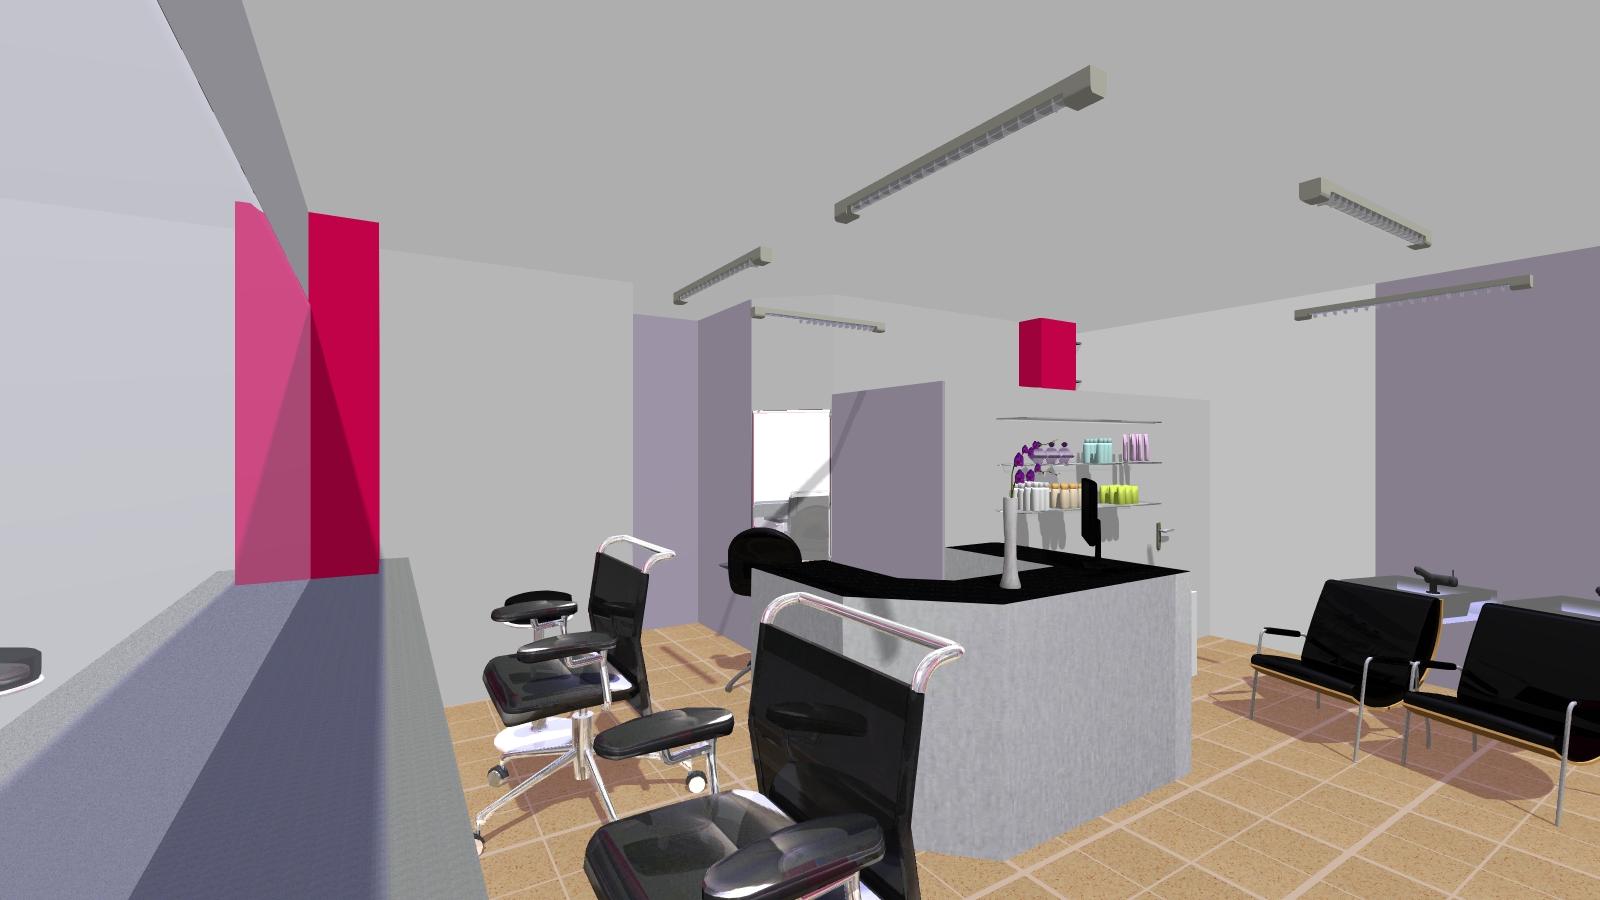 Hom3 le conseil deco salon de coiffure cidalia for Conseil deco salon